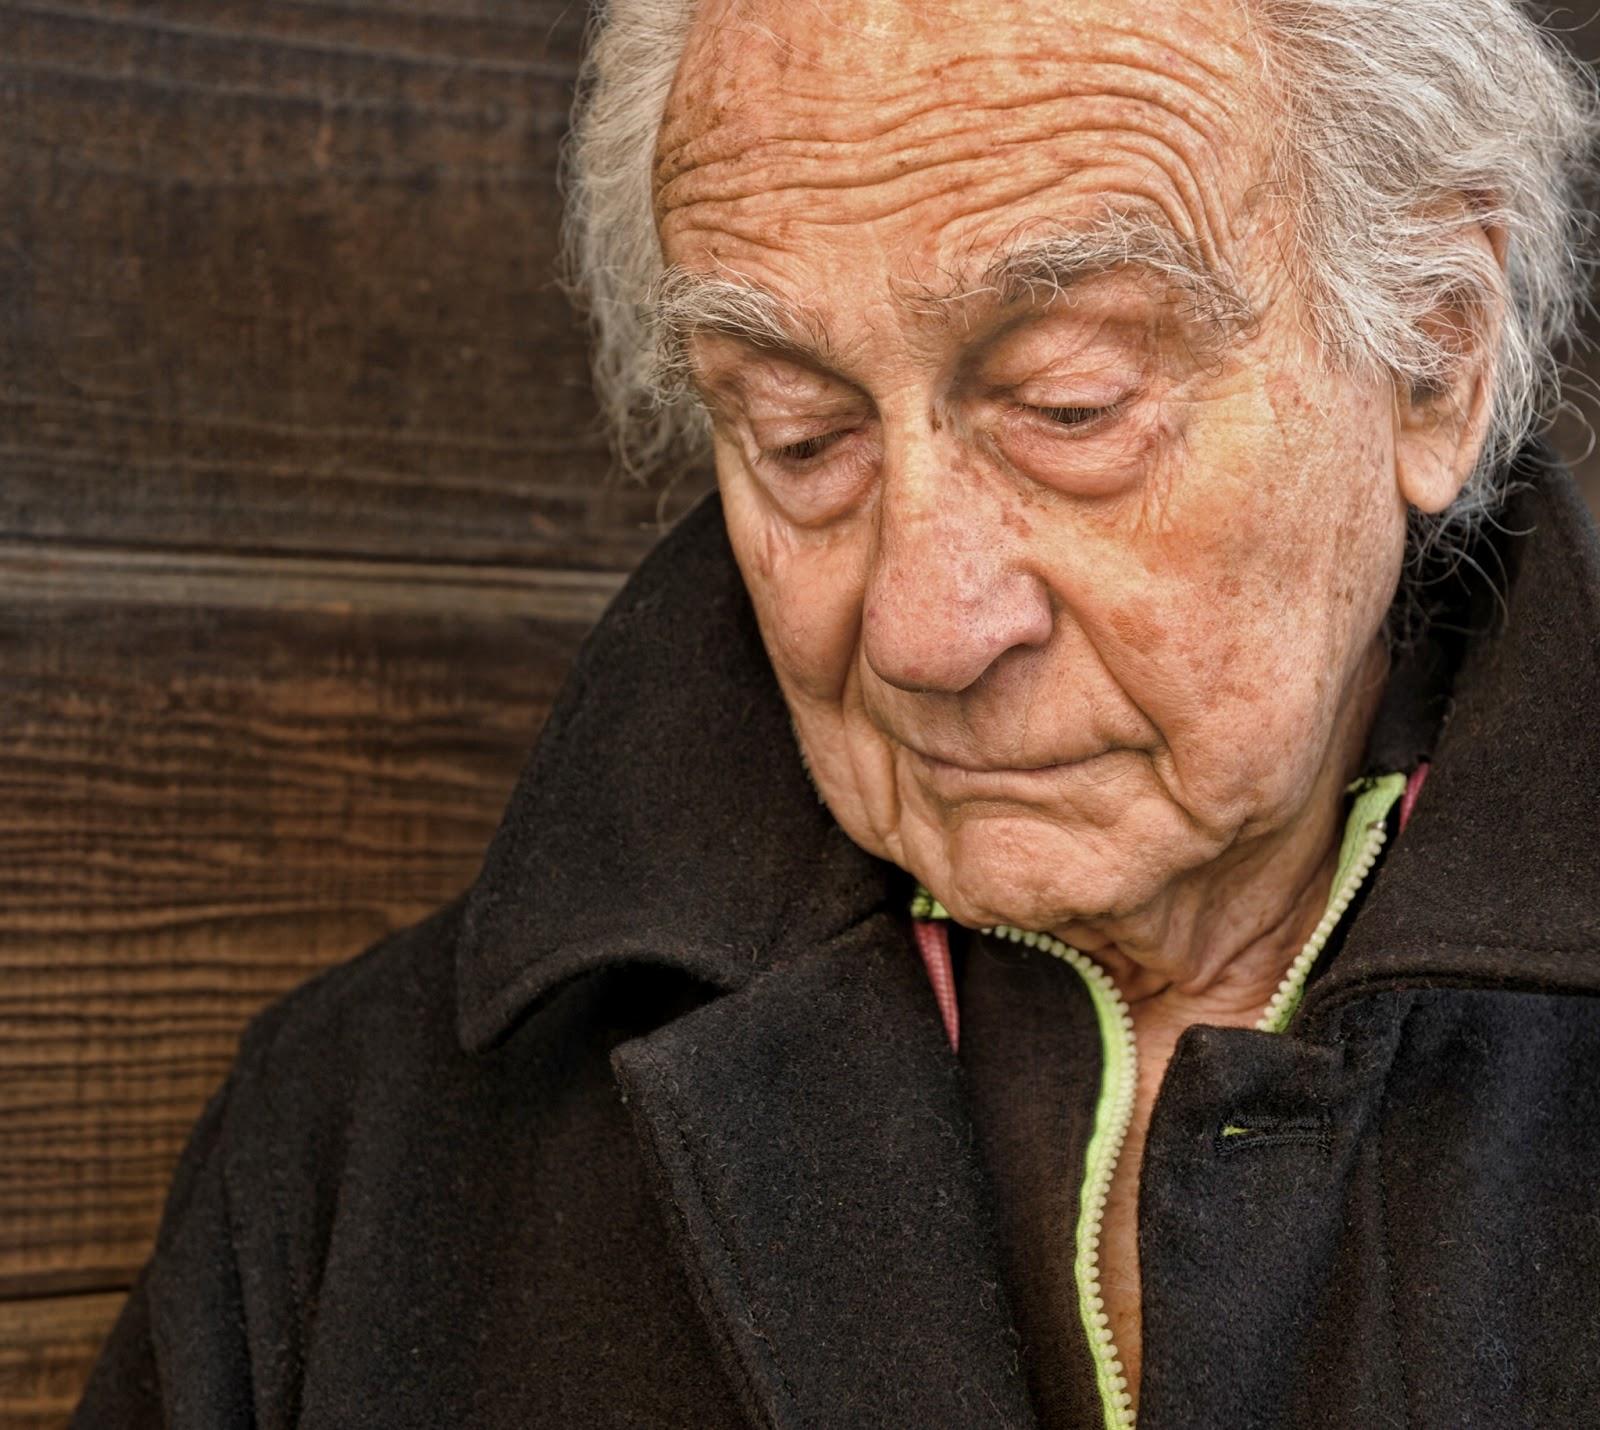 Sad_Old_Man